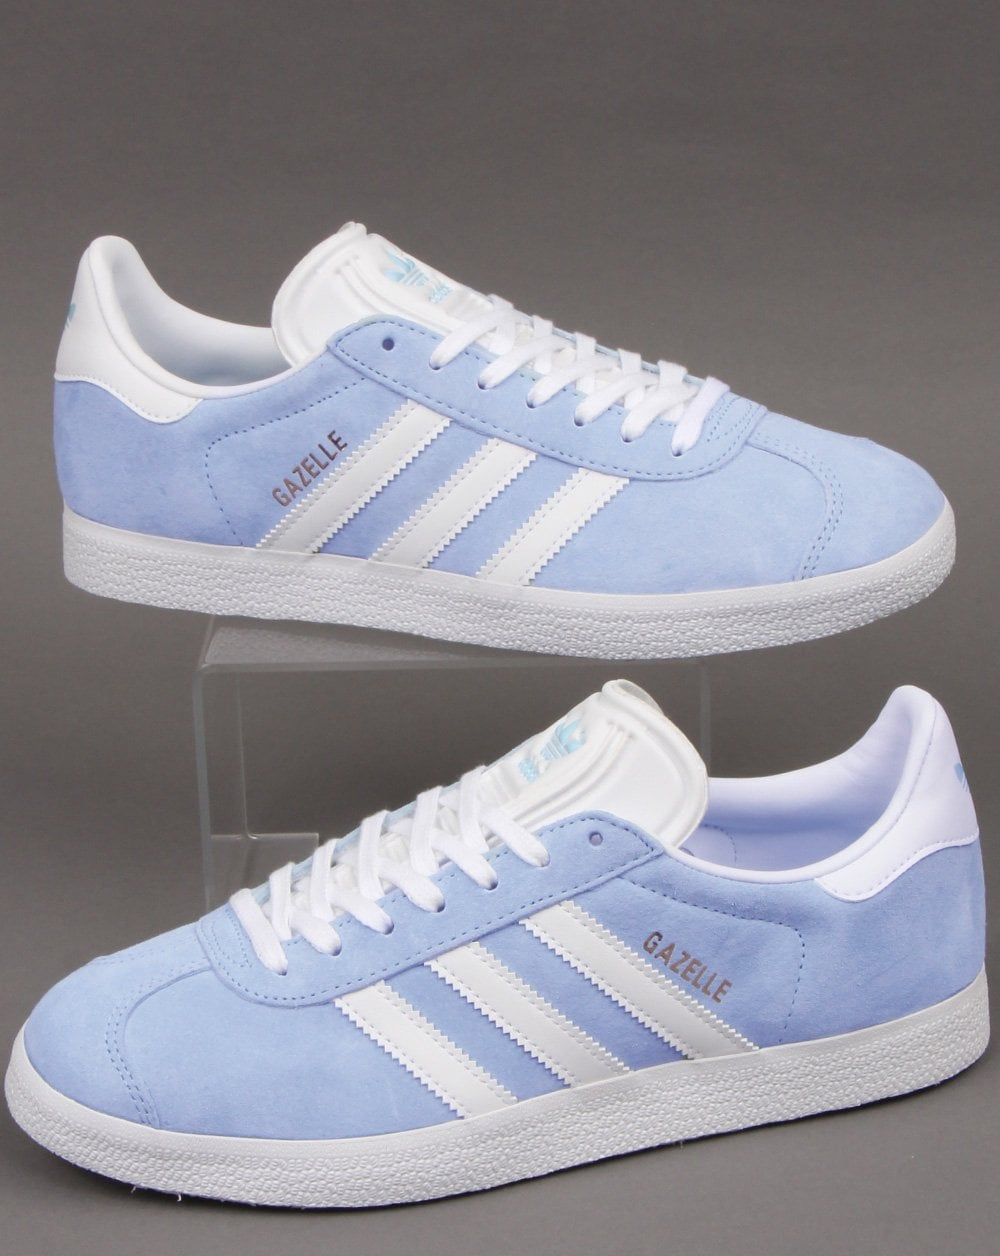 Adidas Gazelle Trainers Sky Blue/white